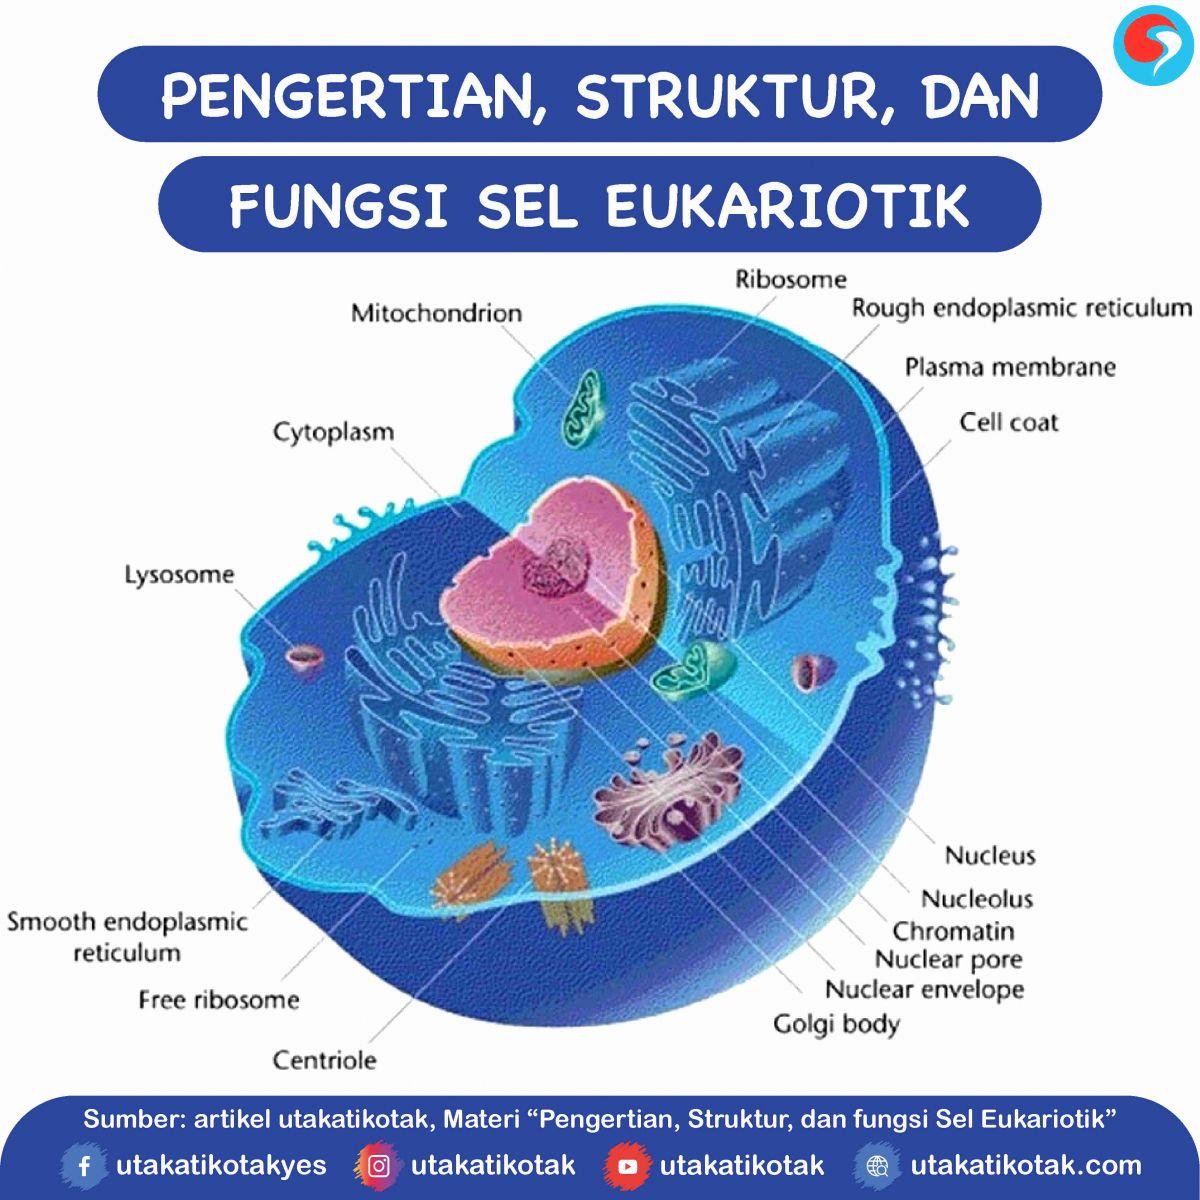 Pengertian Struktur Dan Fungsi Sel Eukariotik